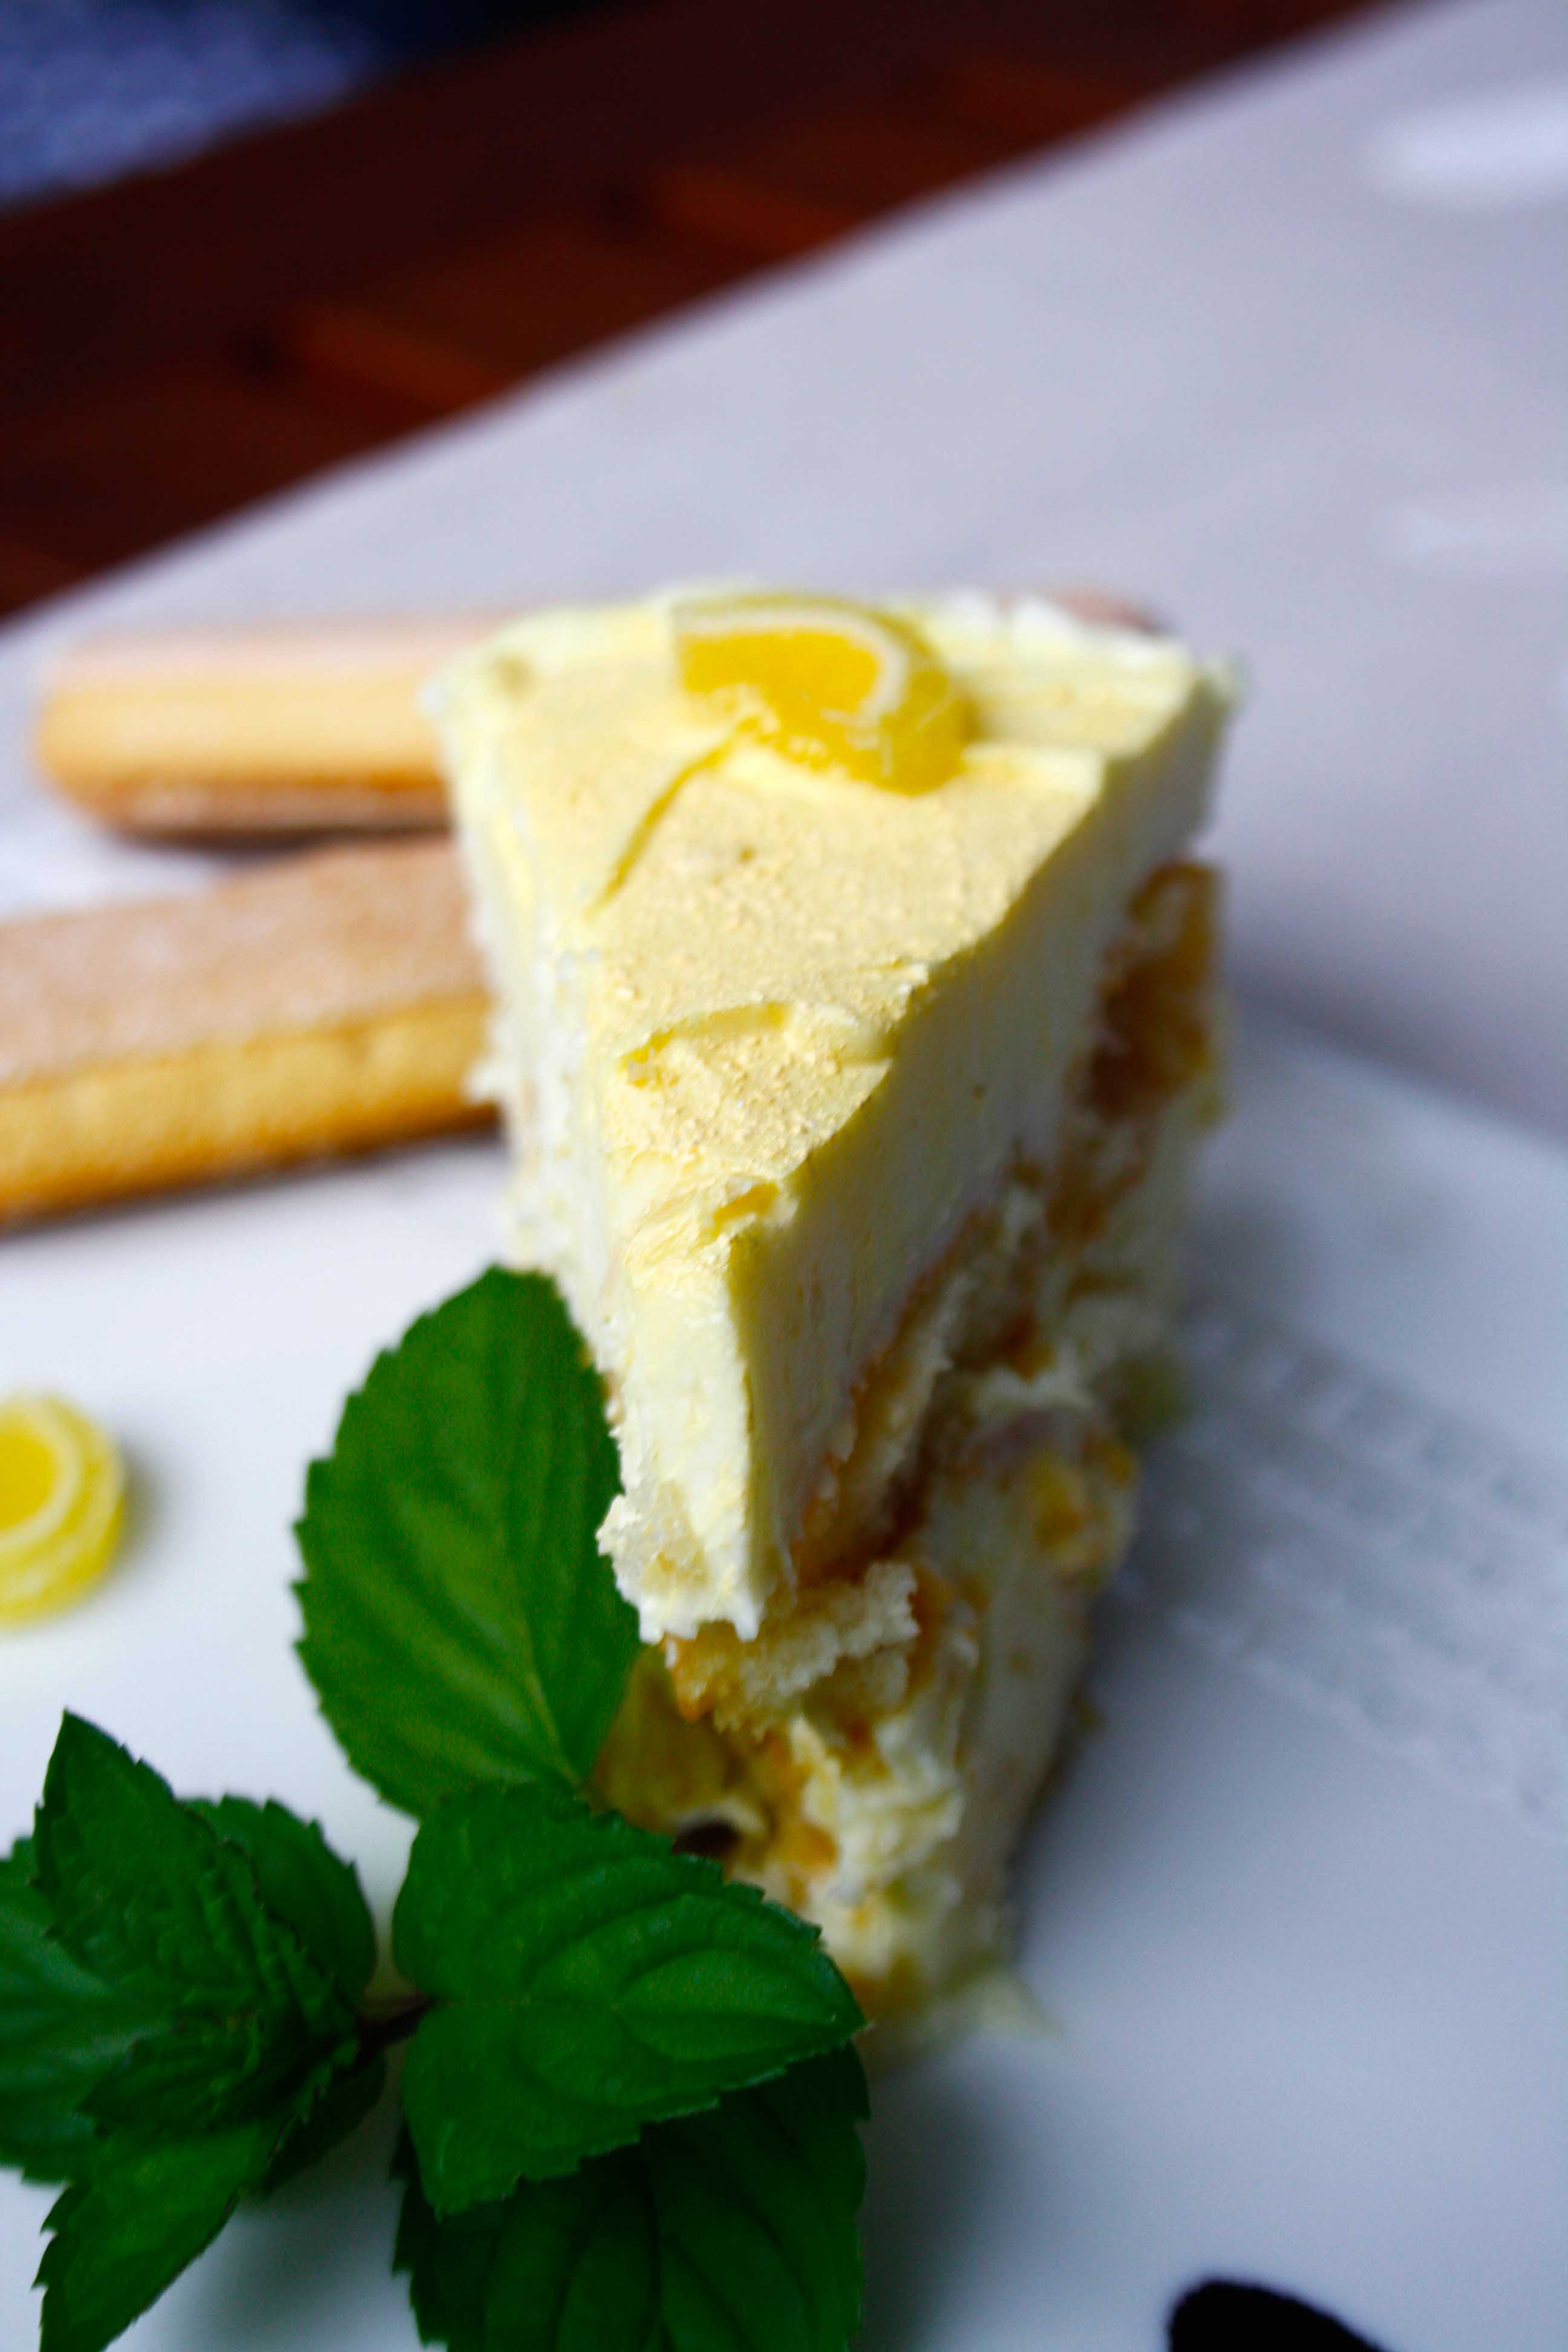 Zitronen-Tiramisu by http://babyrockmyday.com/zitronen-tiramisu/